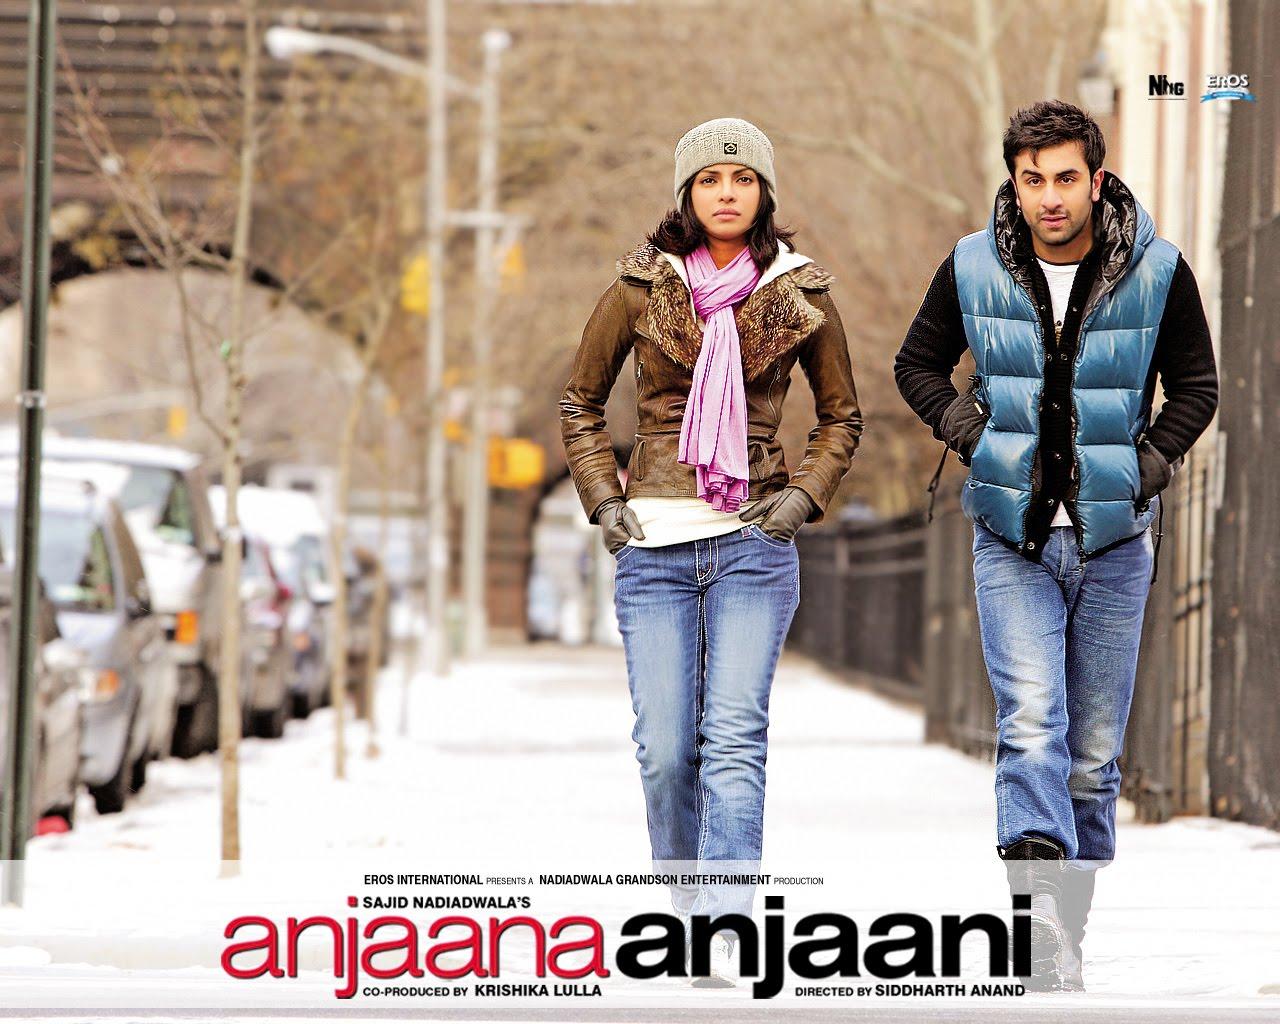 Break Comcs Anjaana Anjaani Movie Wallpapers Download